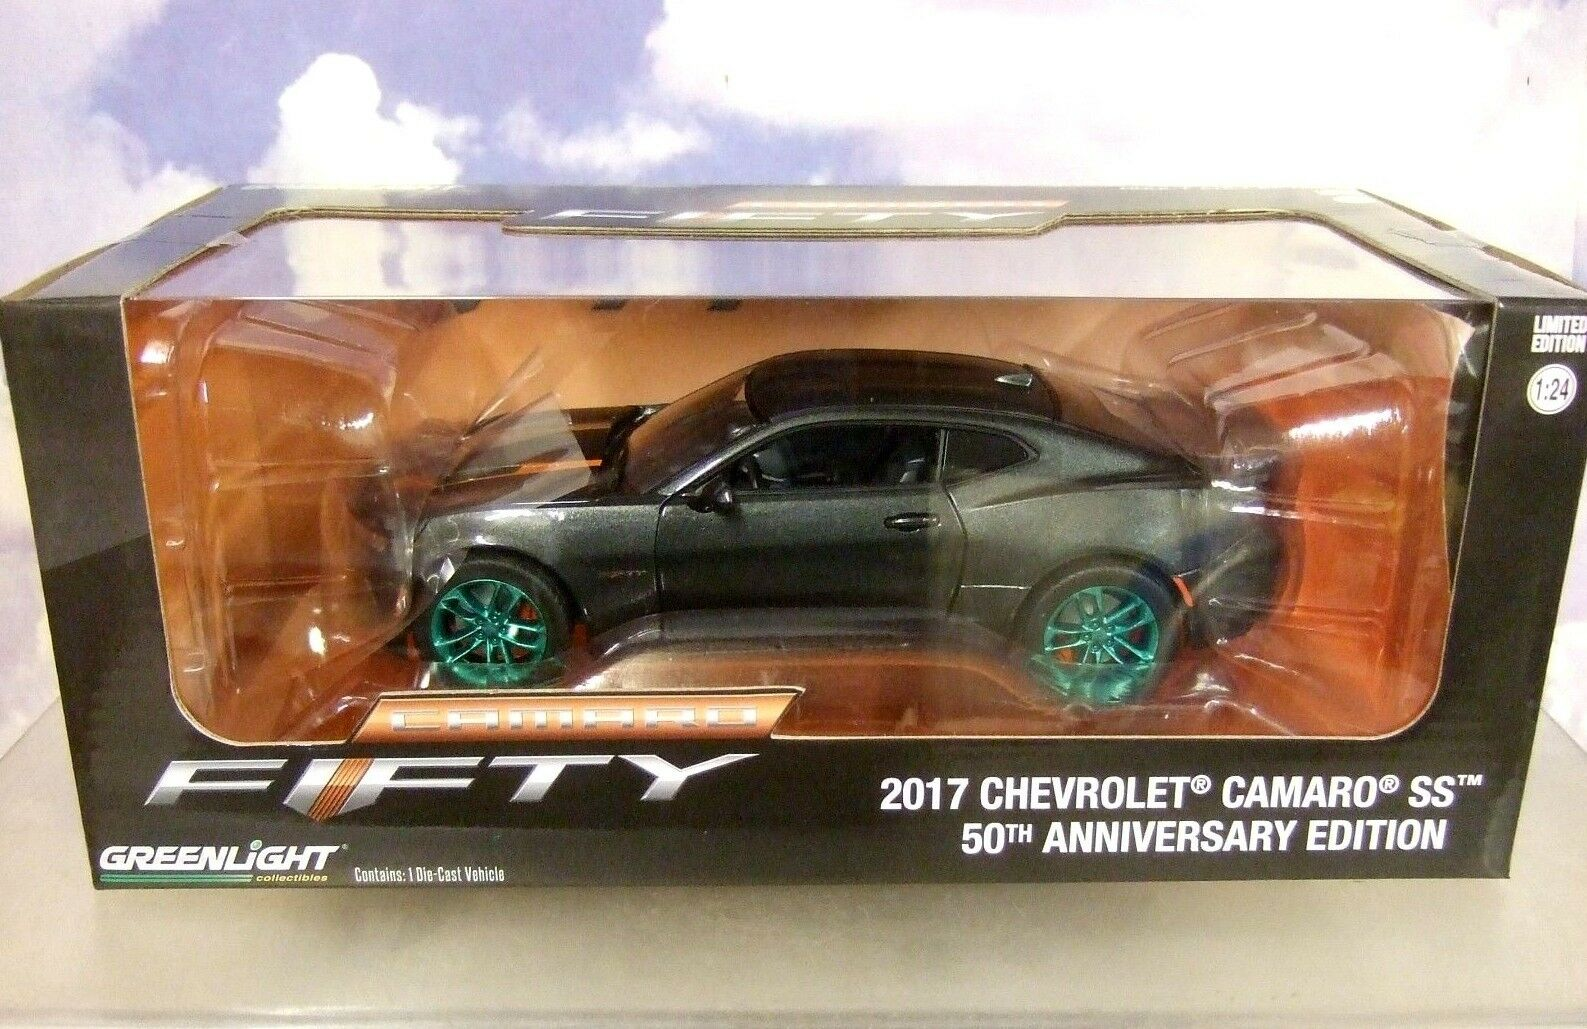 oferta de tienda 1 24 verdelight 2017 Chevrolet Chevy Camaro Ss 50th Aniv. Aniv. Aniv. Edición verde Ruedas  mejor moda